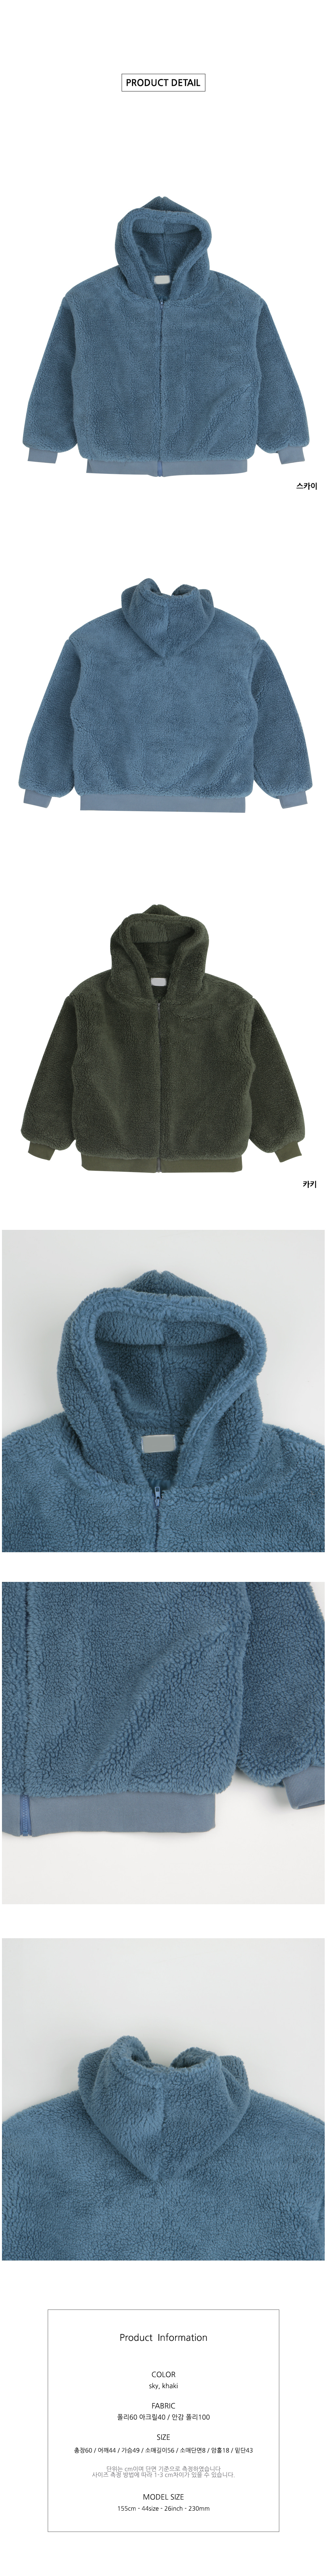 Overfit fleece fleece fleece hooded zip O#YW116